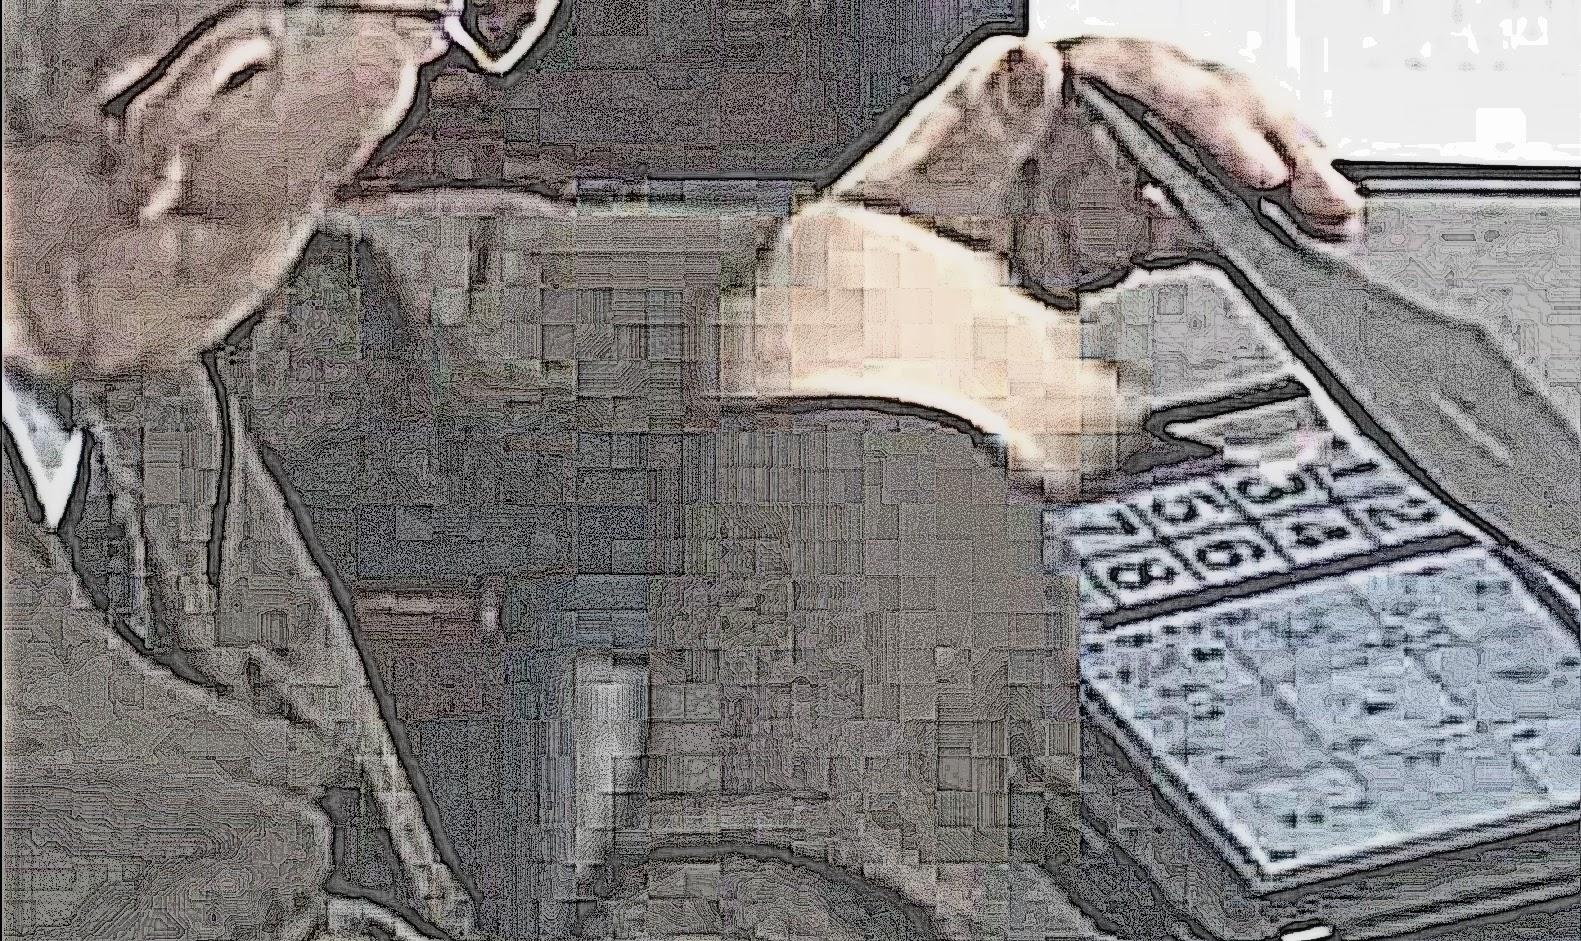 http://2.bp.blogspot.com/-O_7v4E44Ts0/UoOKTcKZYmI/AAAAAAAAAb0/Zct5JREULCw/s1600/sudoku.jpg